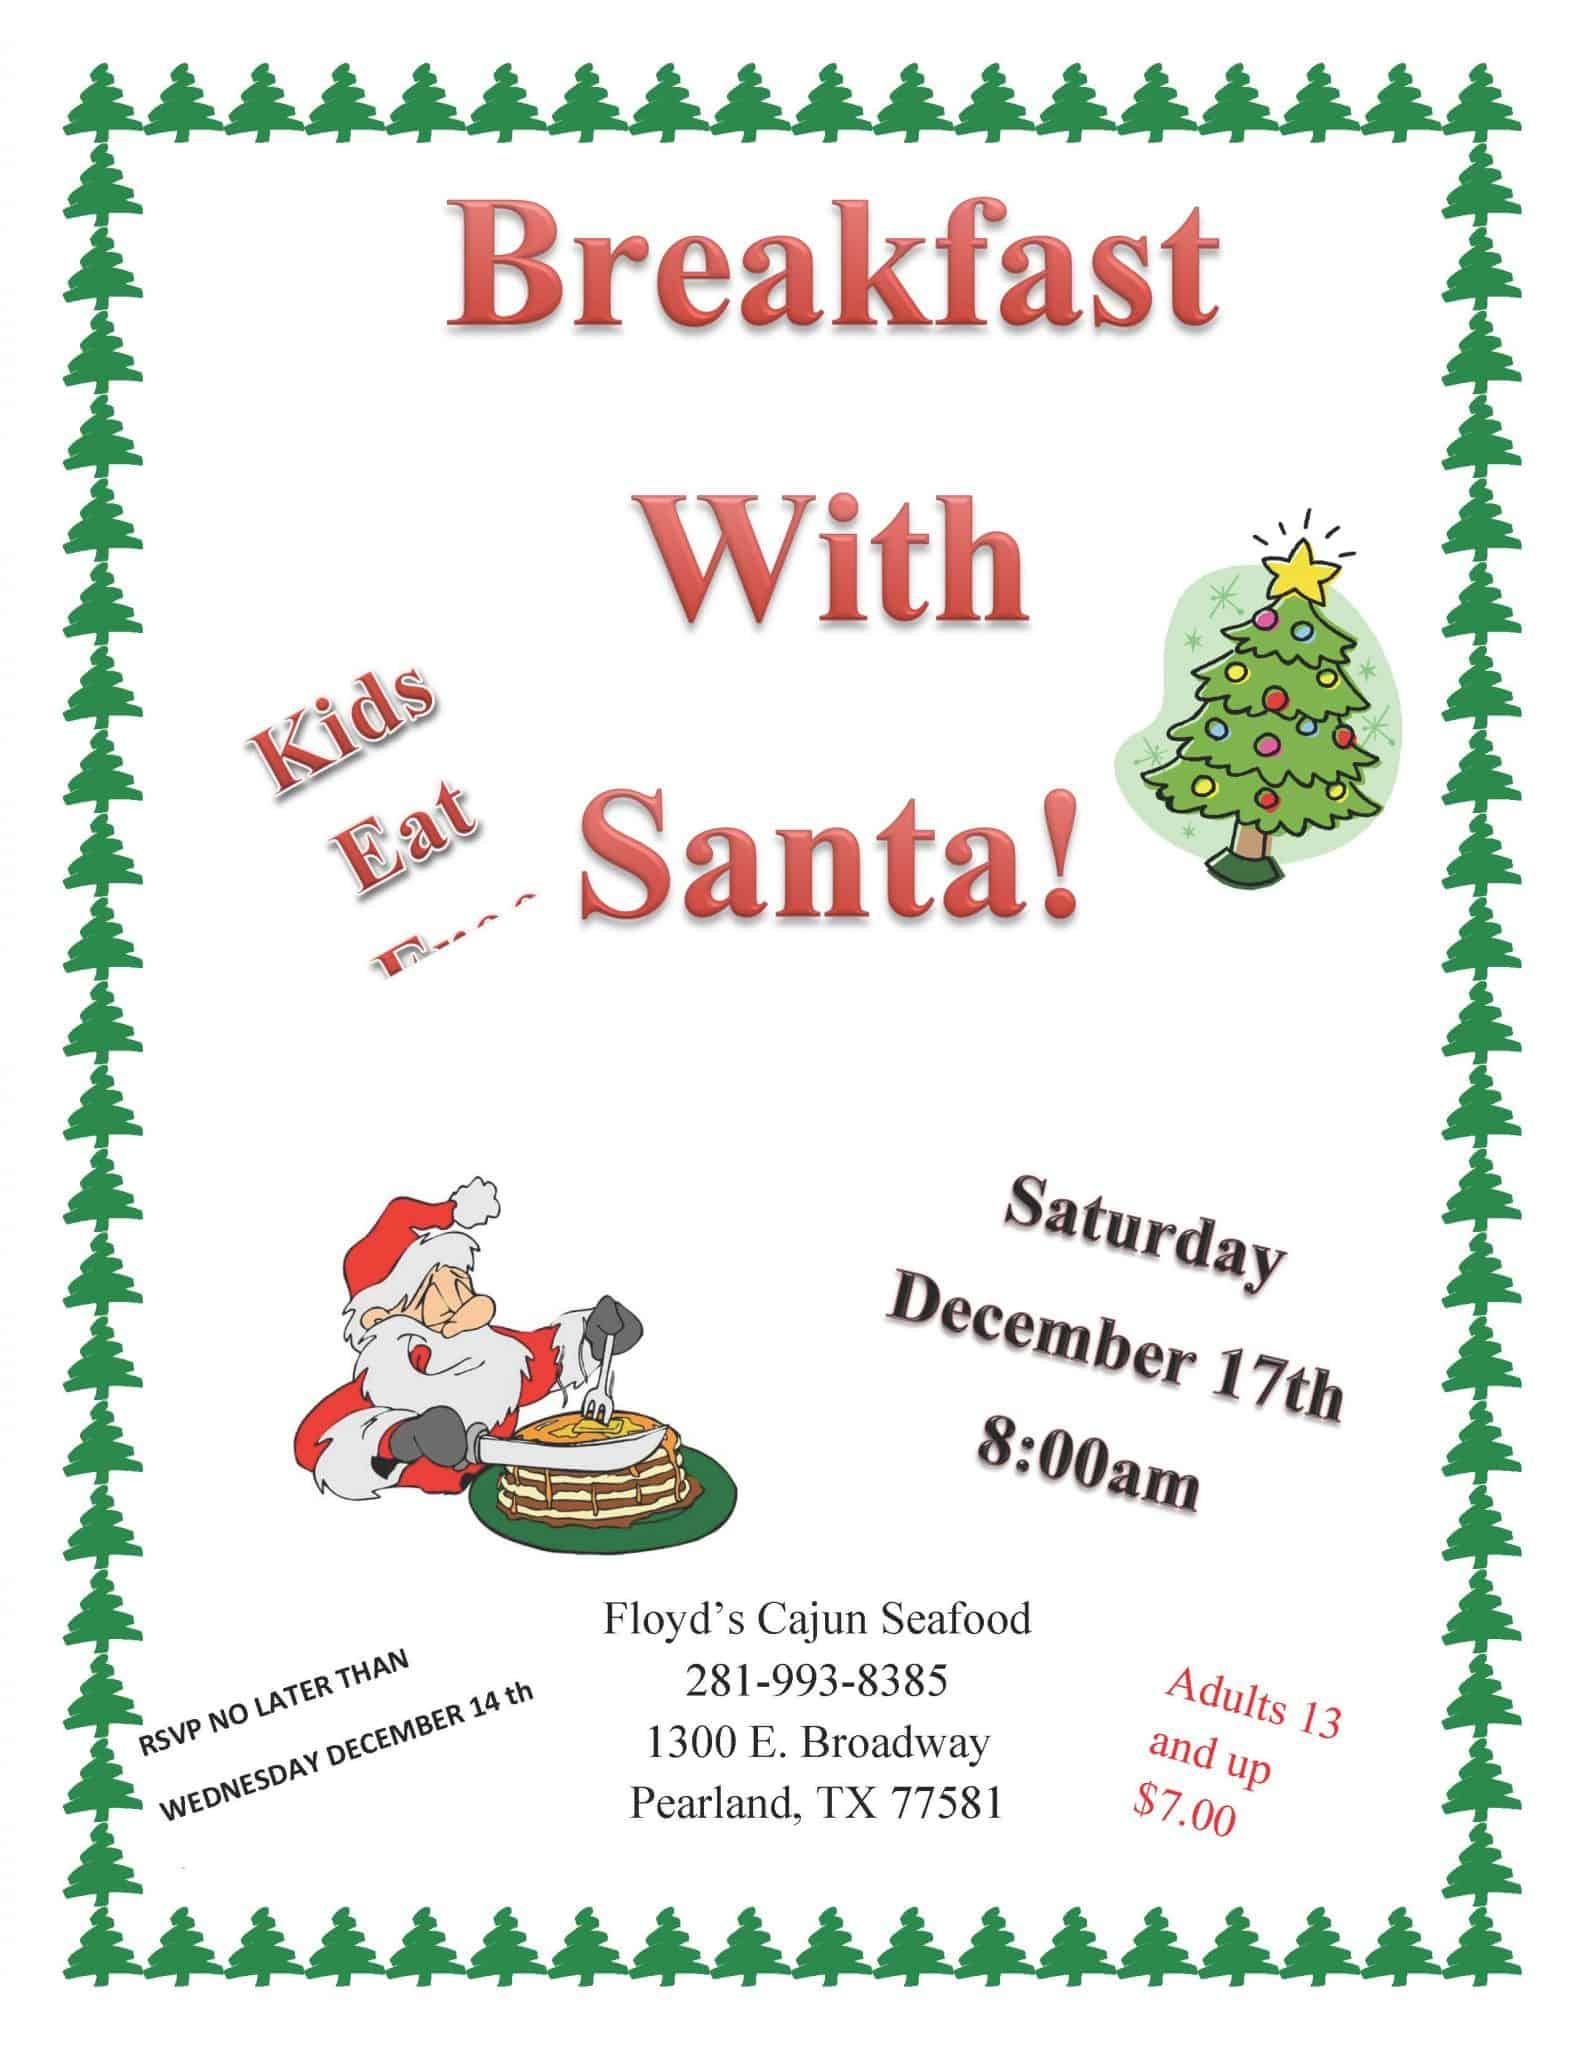 Floyd's Cajun Seafood Presents Breakfast With Santa ...